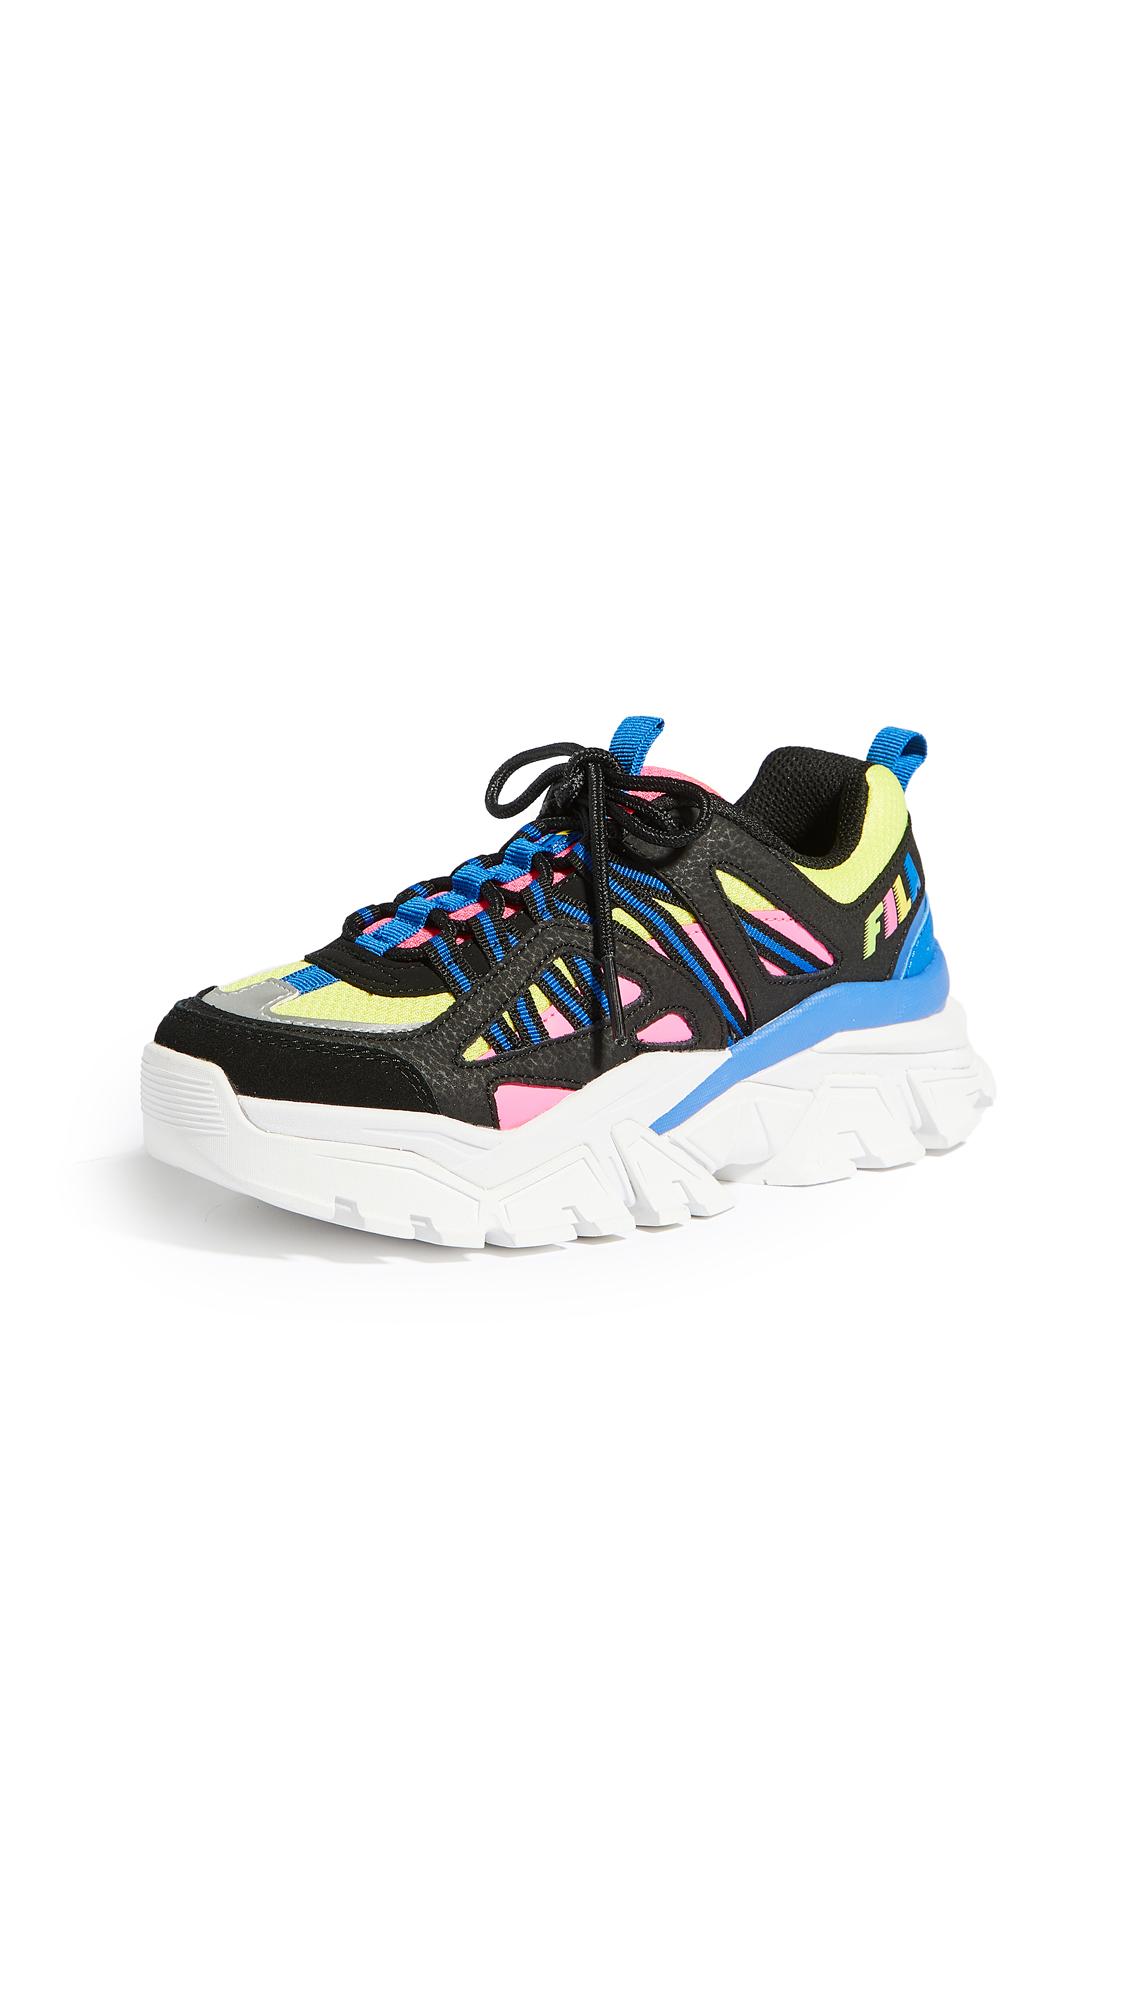 Fila Vitalize Sneakers from Shopbop